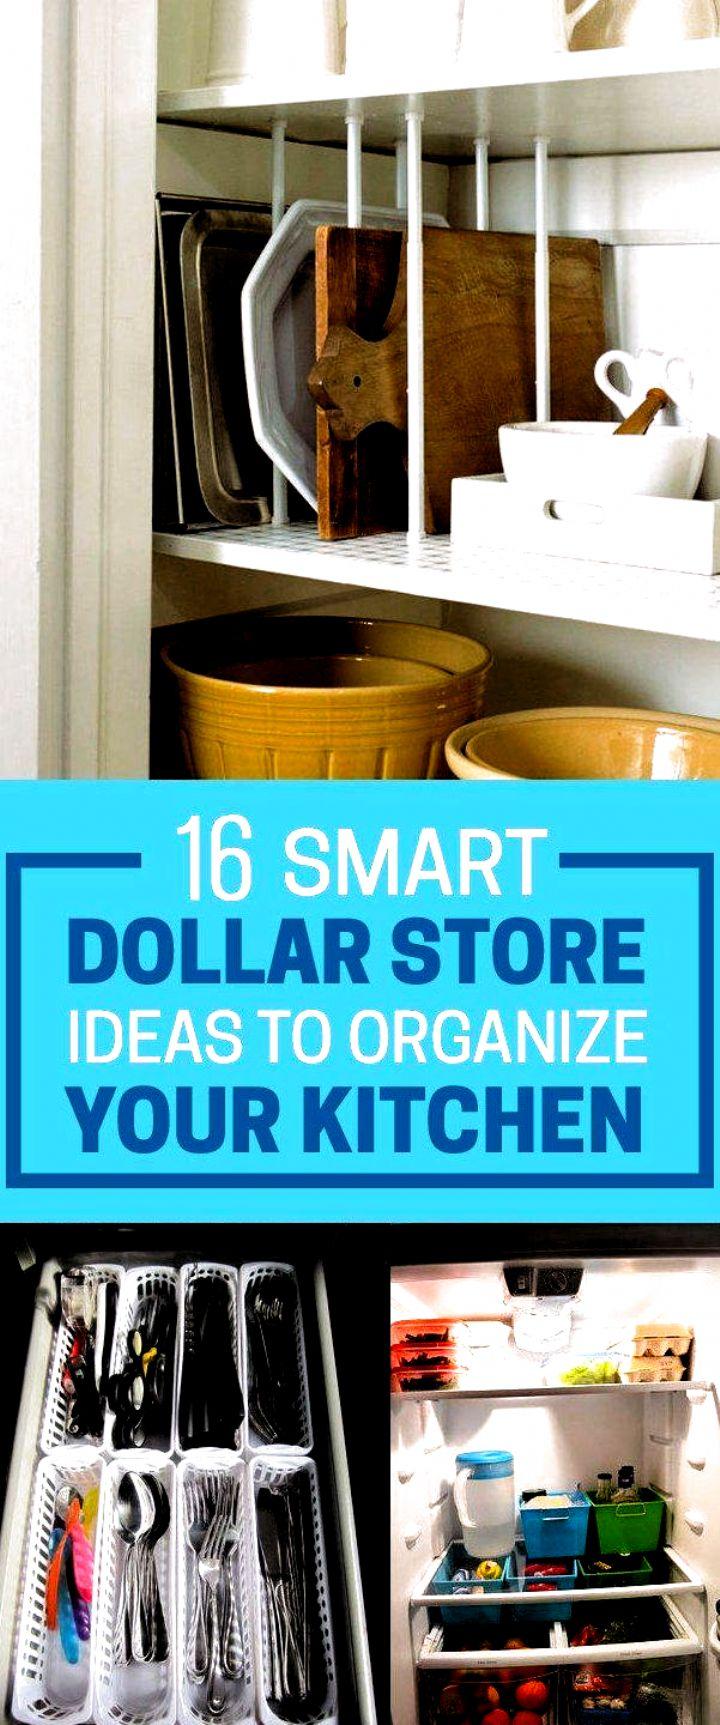 16 Smart Dollar Store Ideas To Declutter Your Kitchen ...